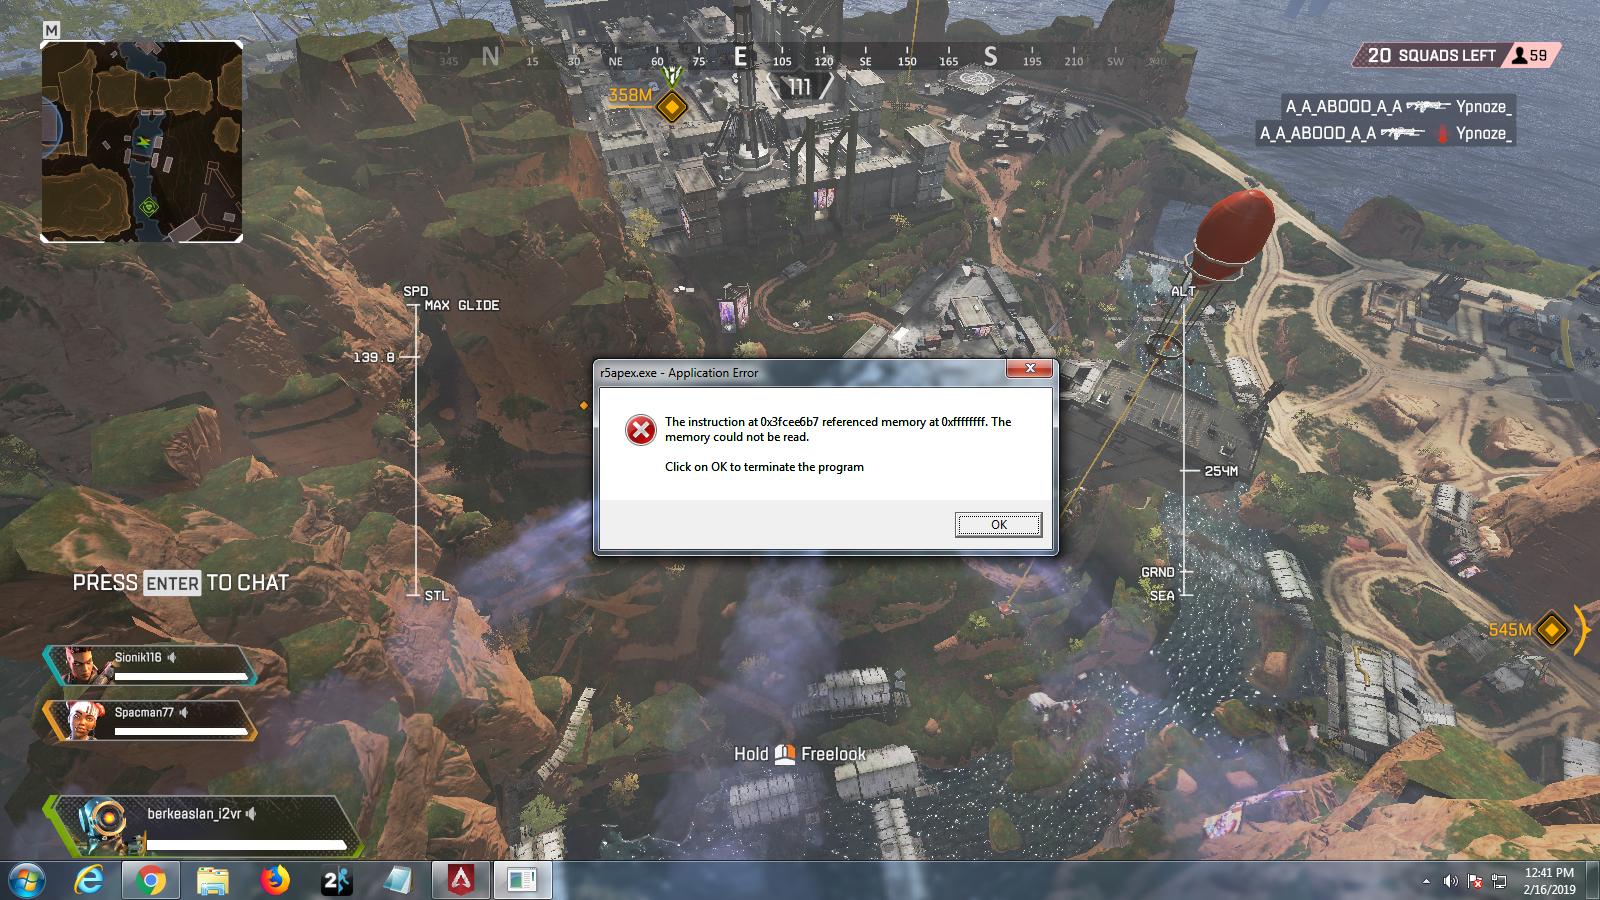 Apex Legends Crashing Randomly In Game Windows 7 Answer Hq